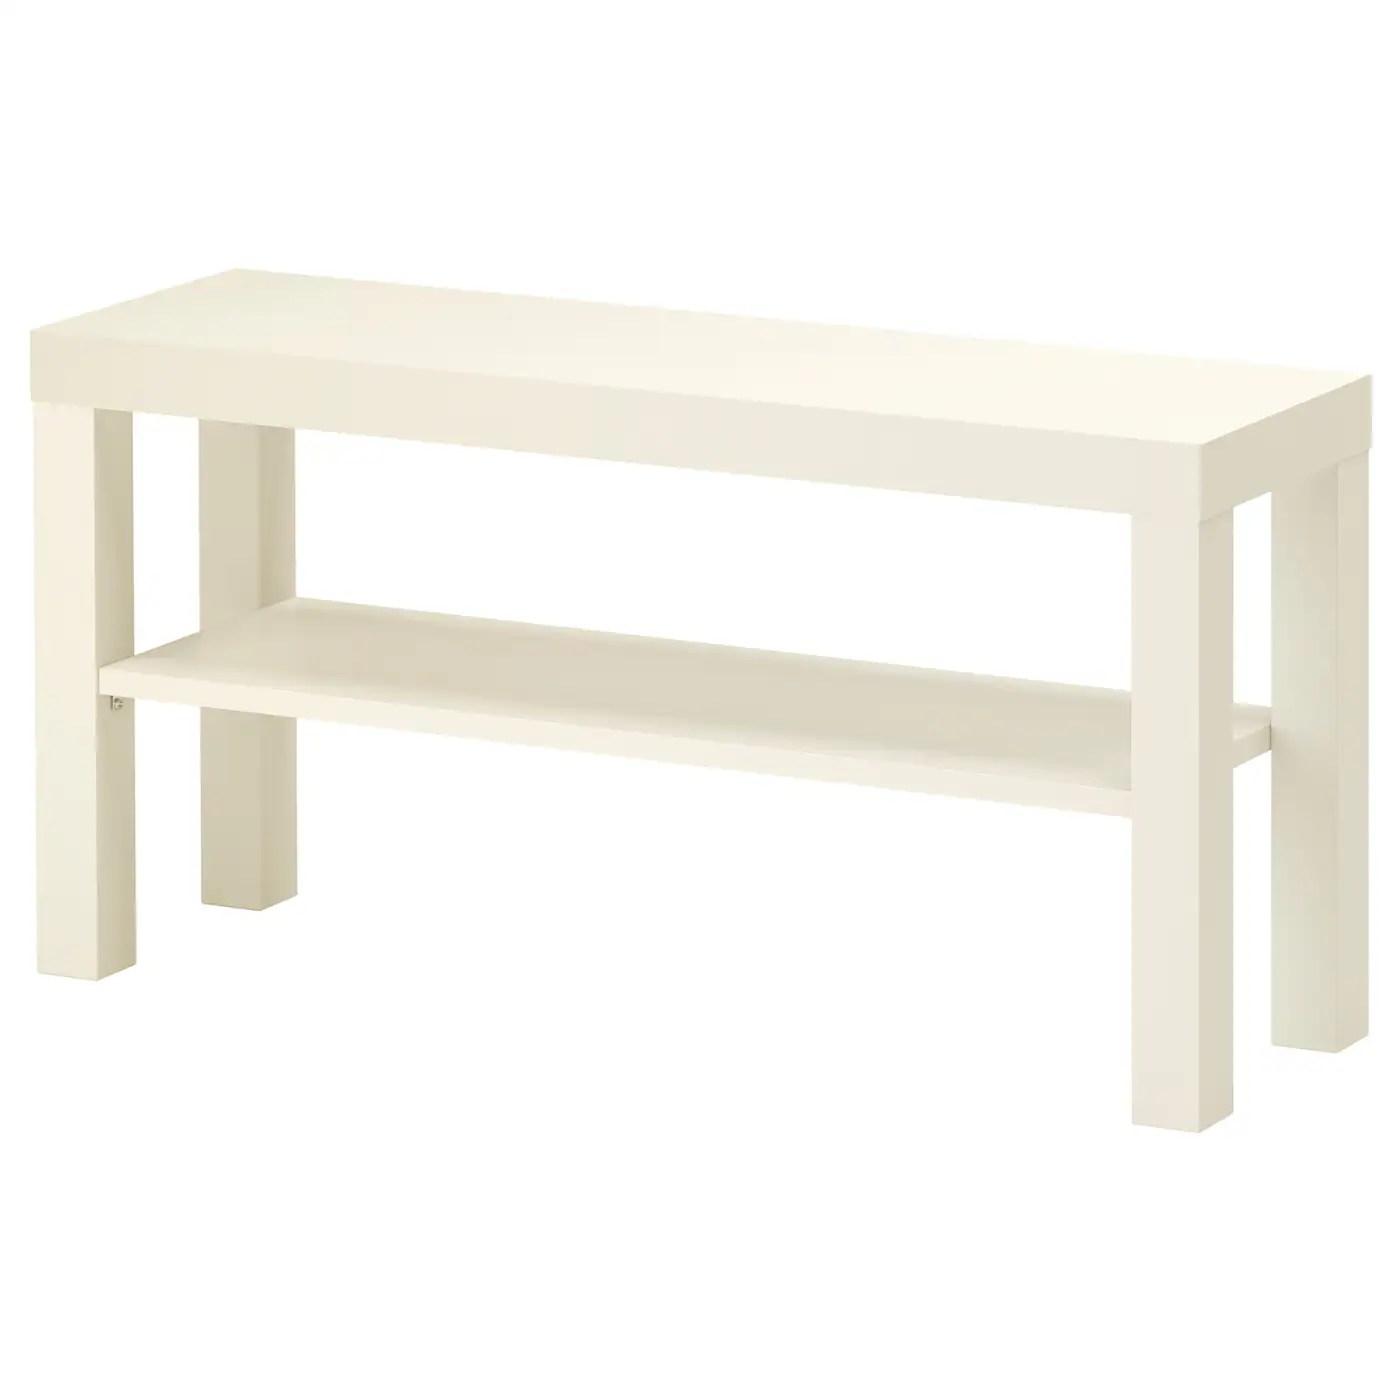 tv chair ikea nada sportbacker lack bench white 90x26 cm